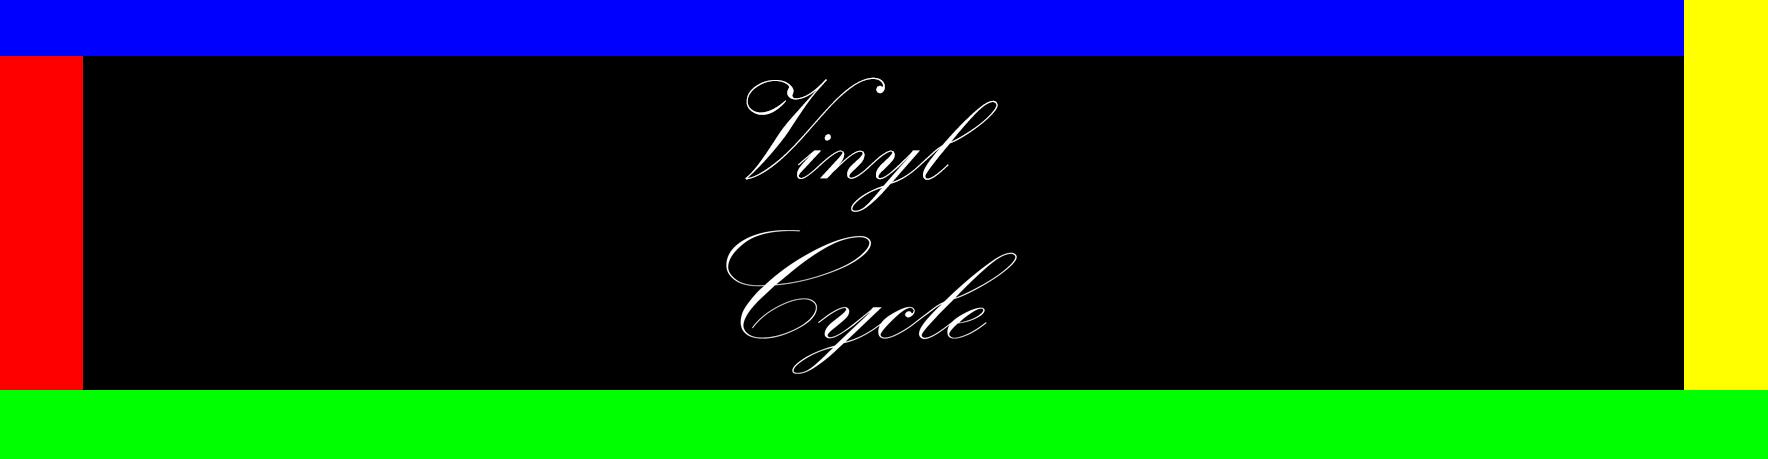 Vinyl Cycle